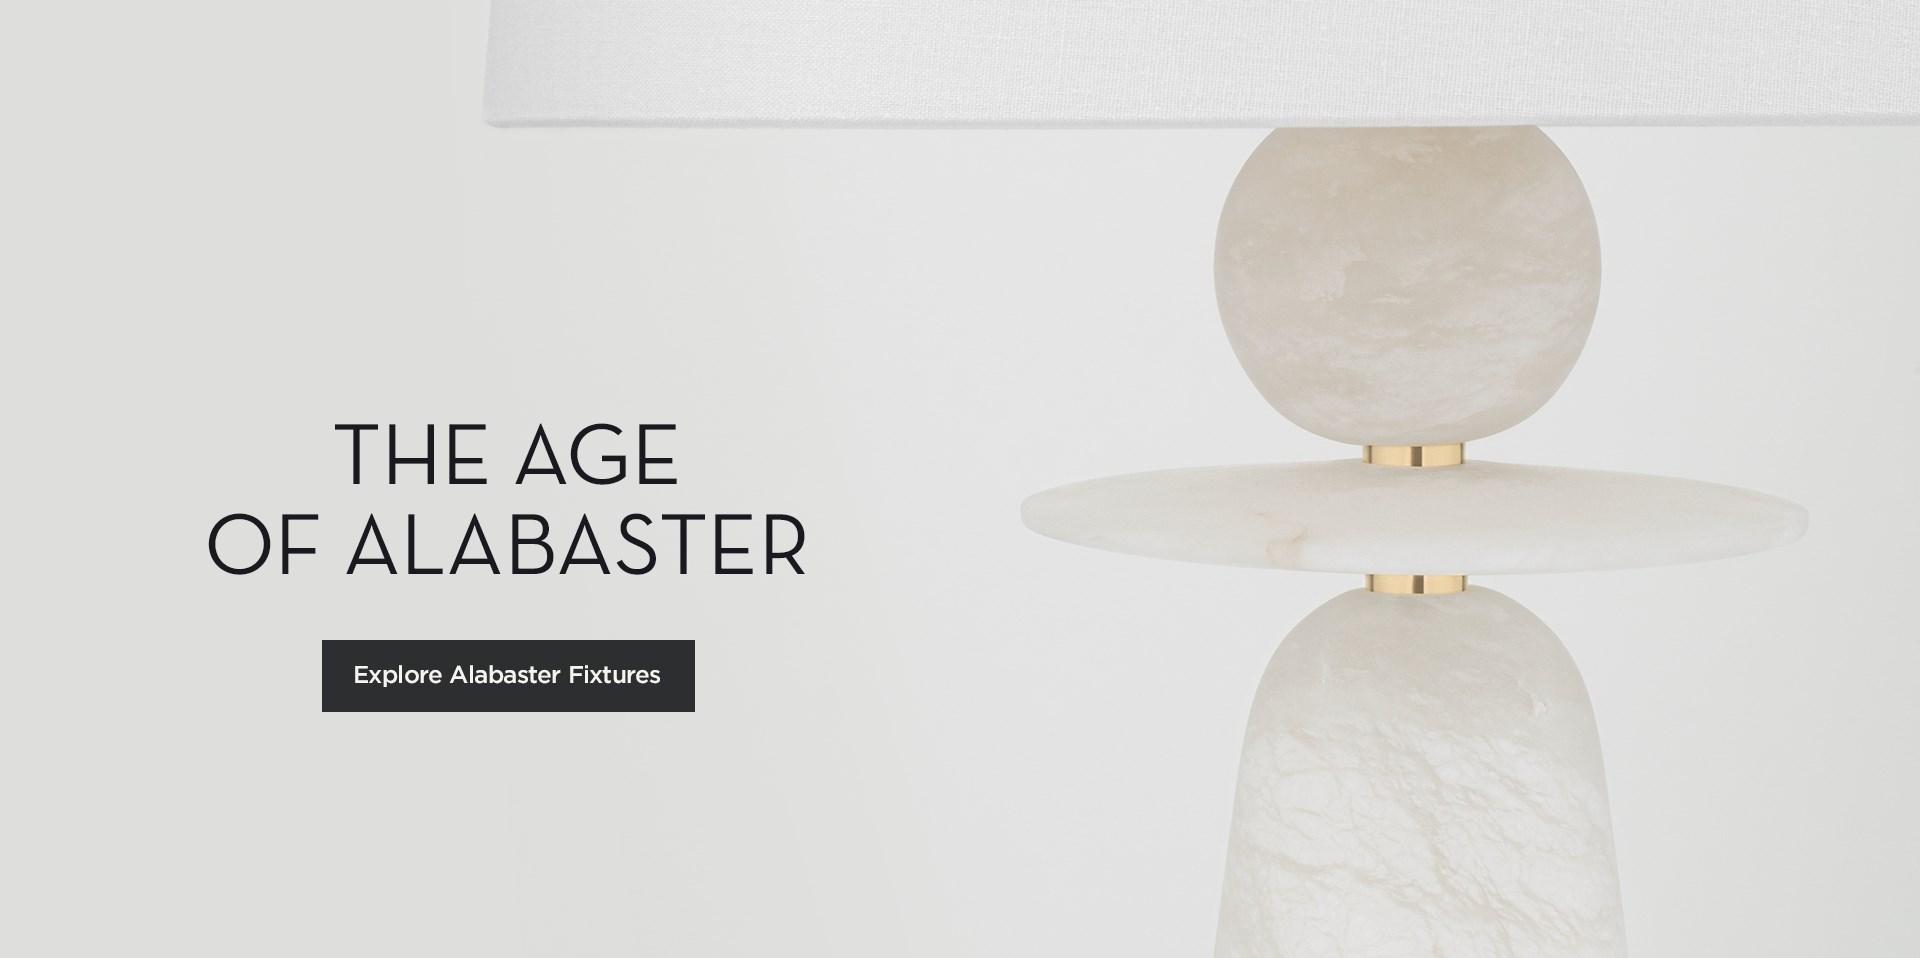 Explore Alabaster Fixtures